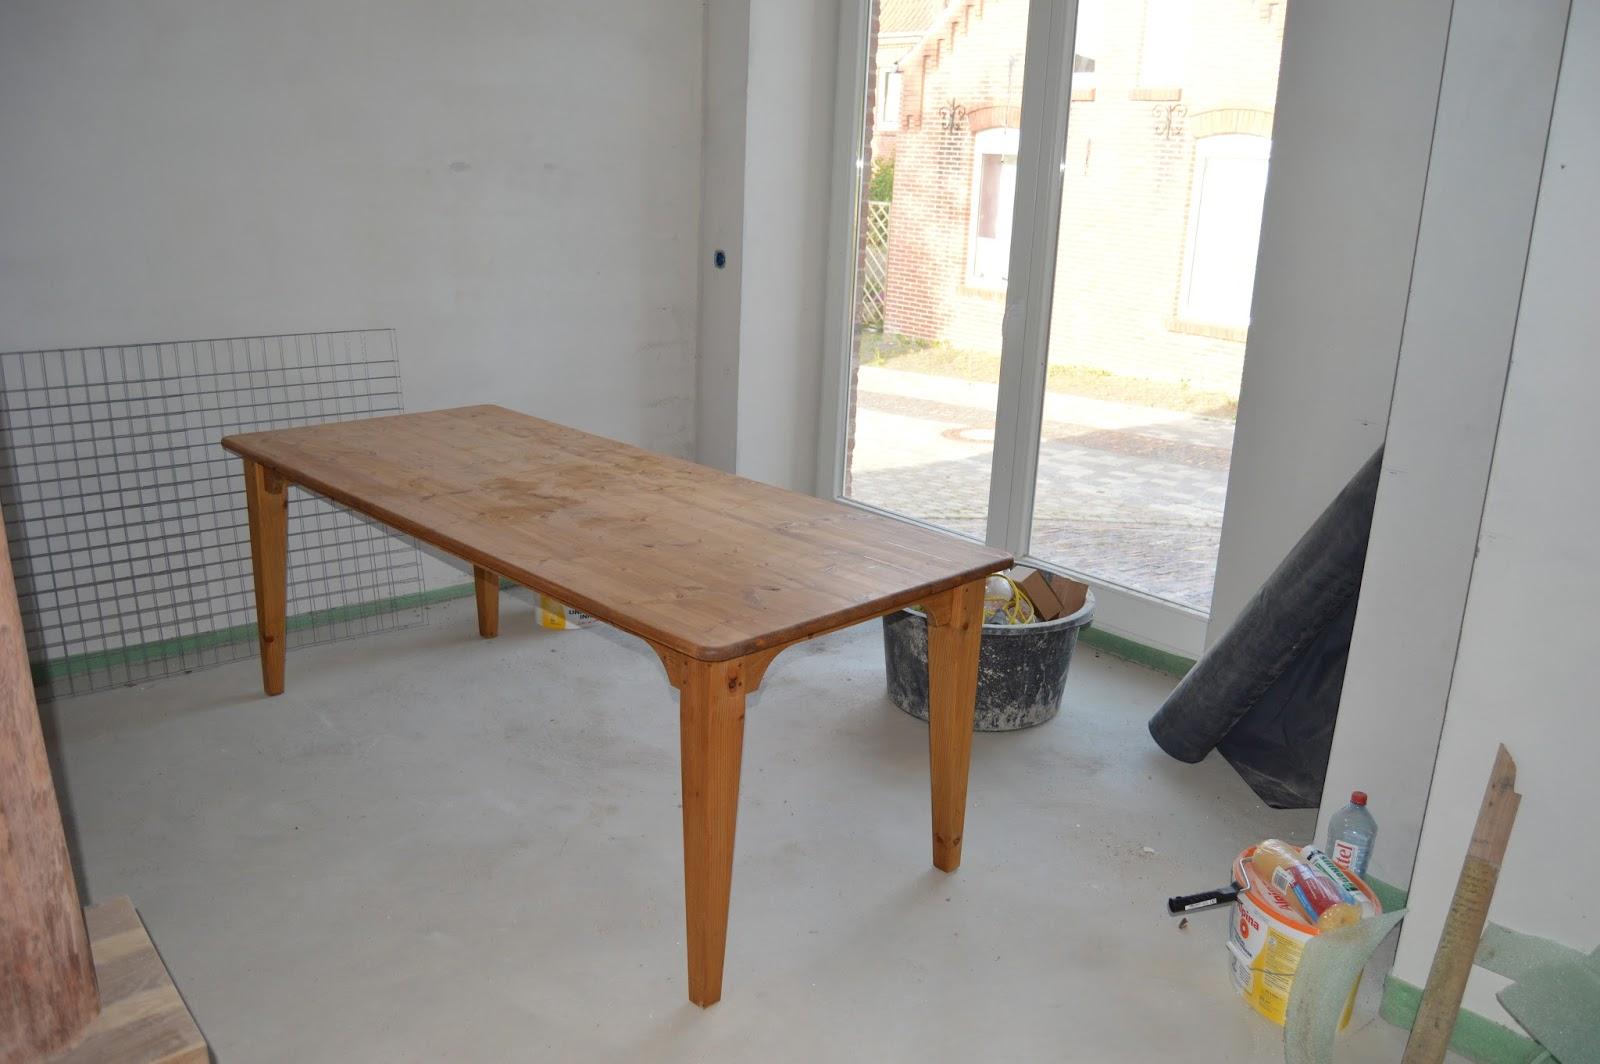 die alte b ckerei in westerhusen die gro e tafel. Black Bedroom Furniture Sets. Home Design Ideas